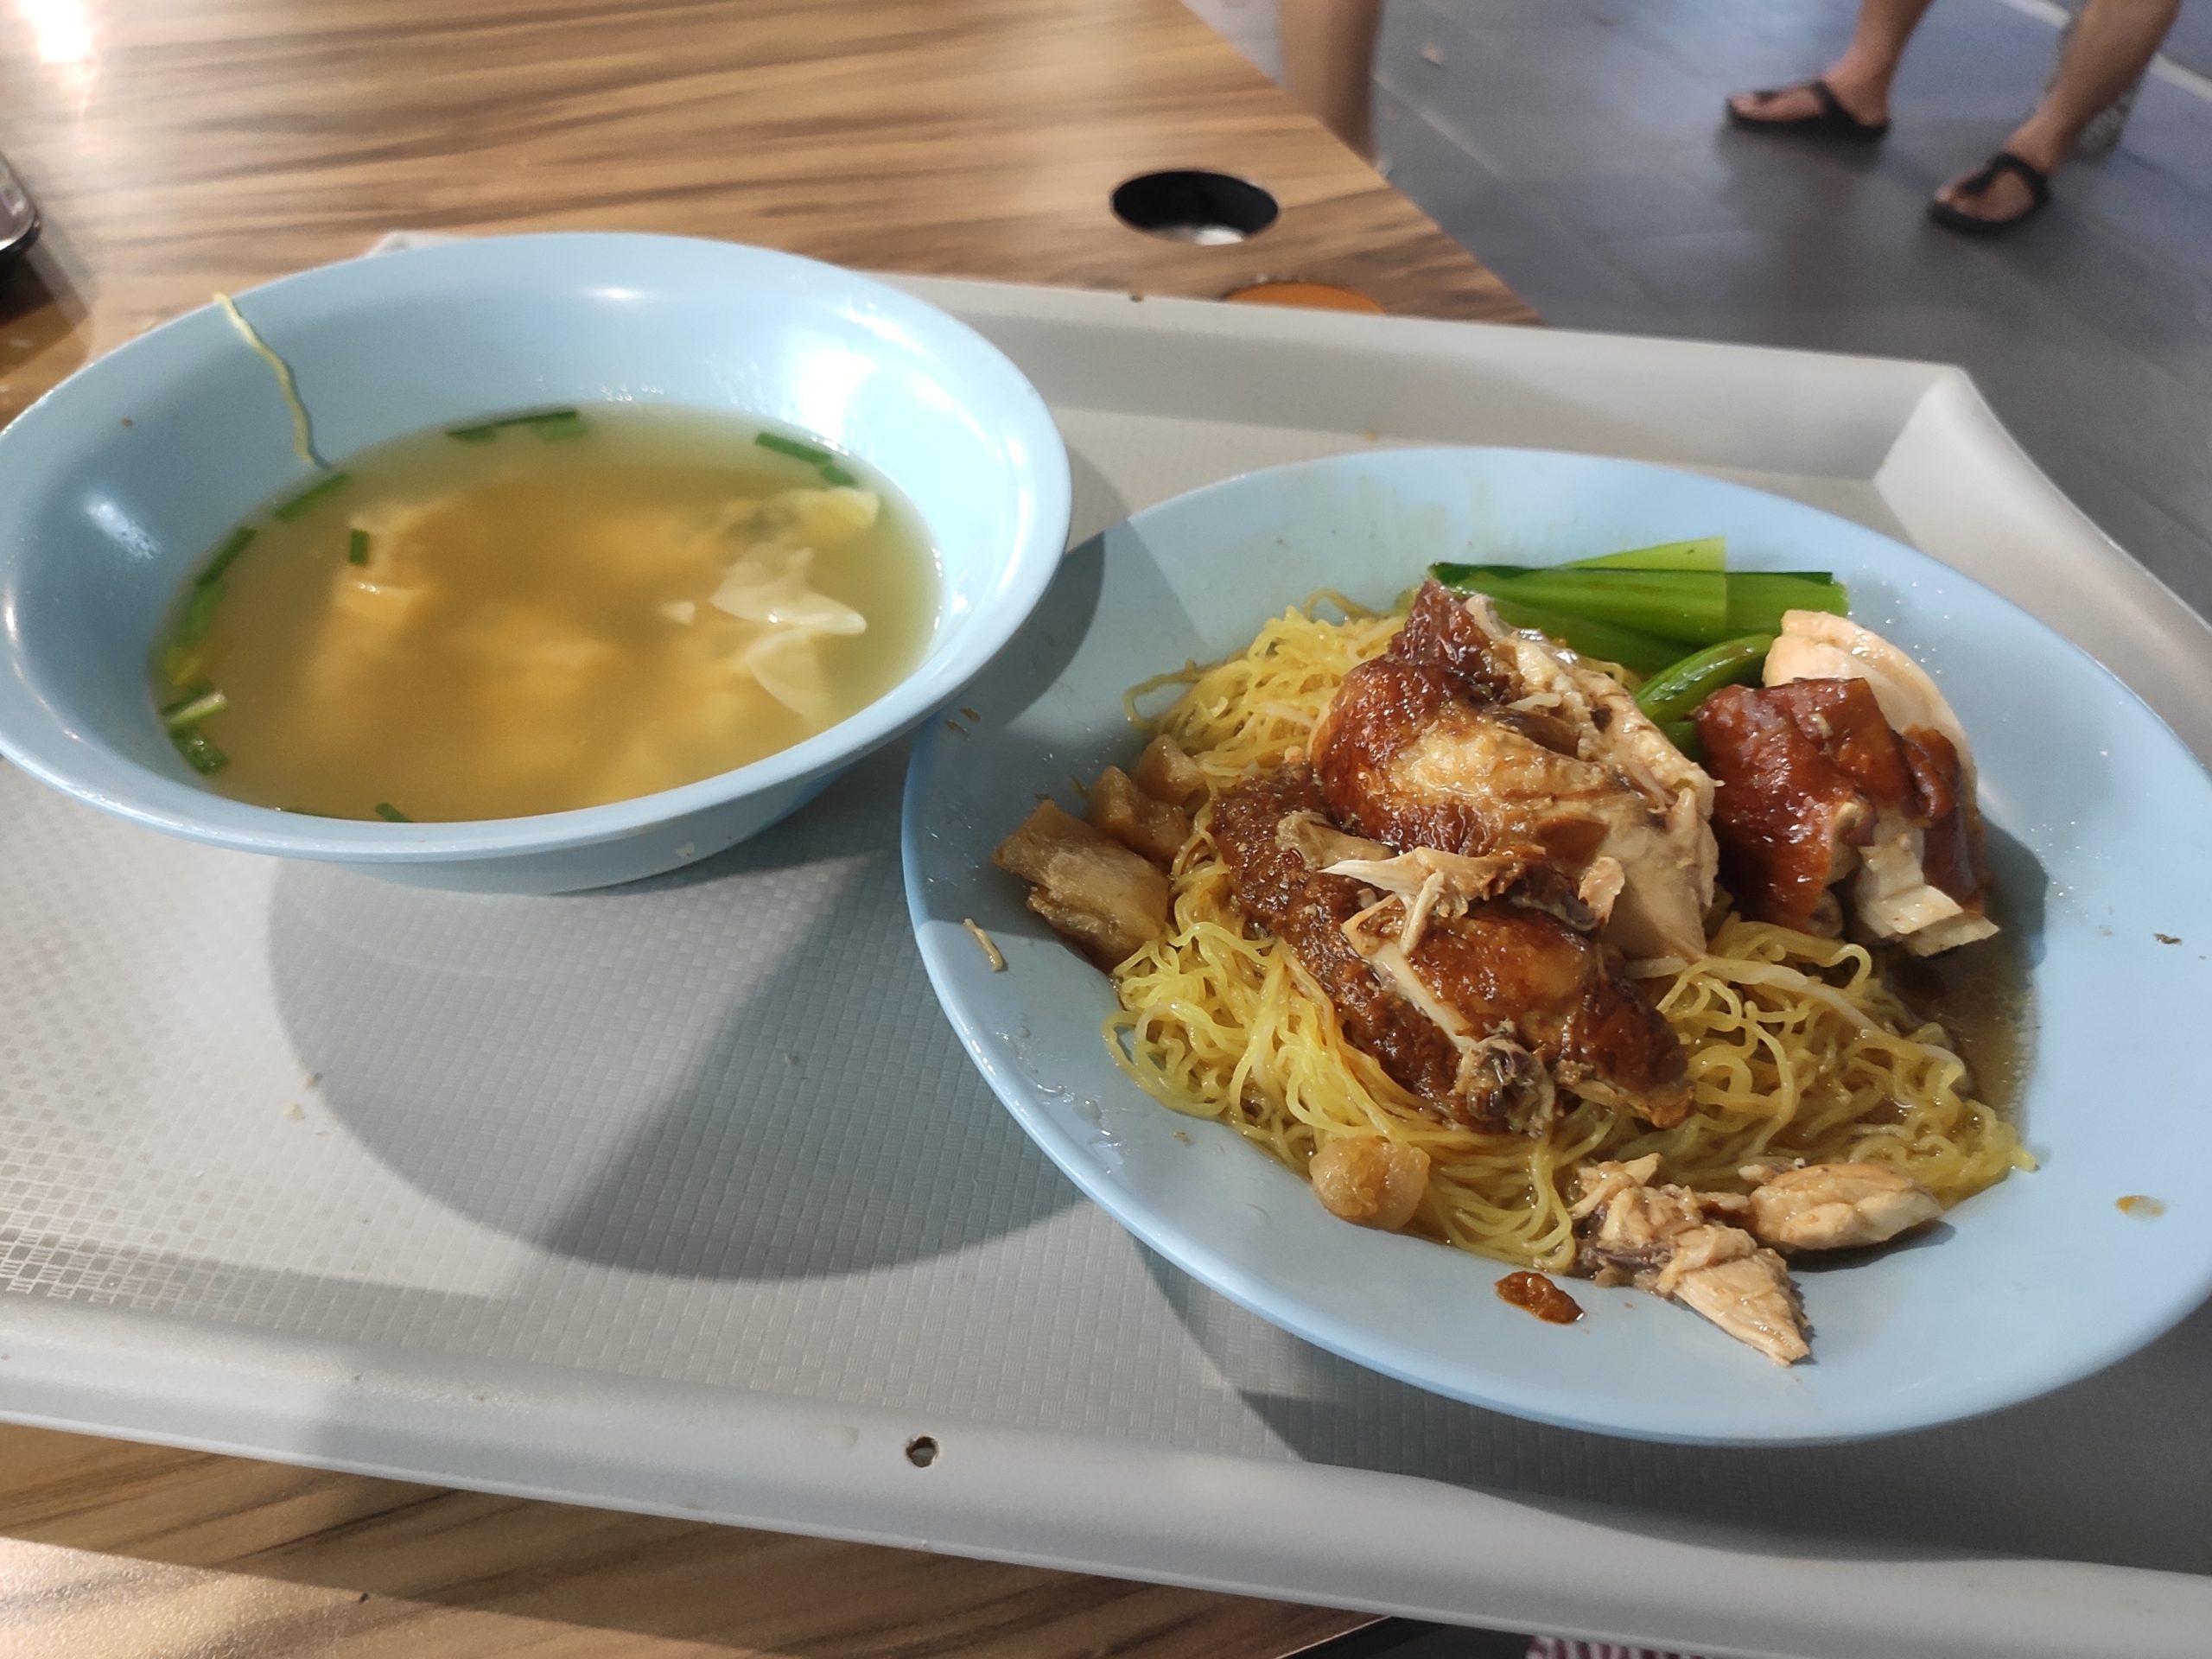 Sheng Ji Soya Sauce Chicken Rice Noodle: Soya Sauce Chicken Noodles with Dumplings Soup